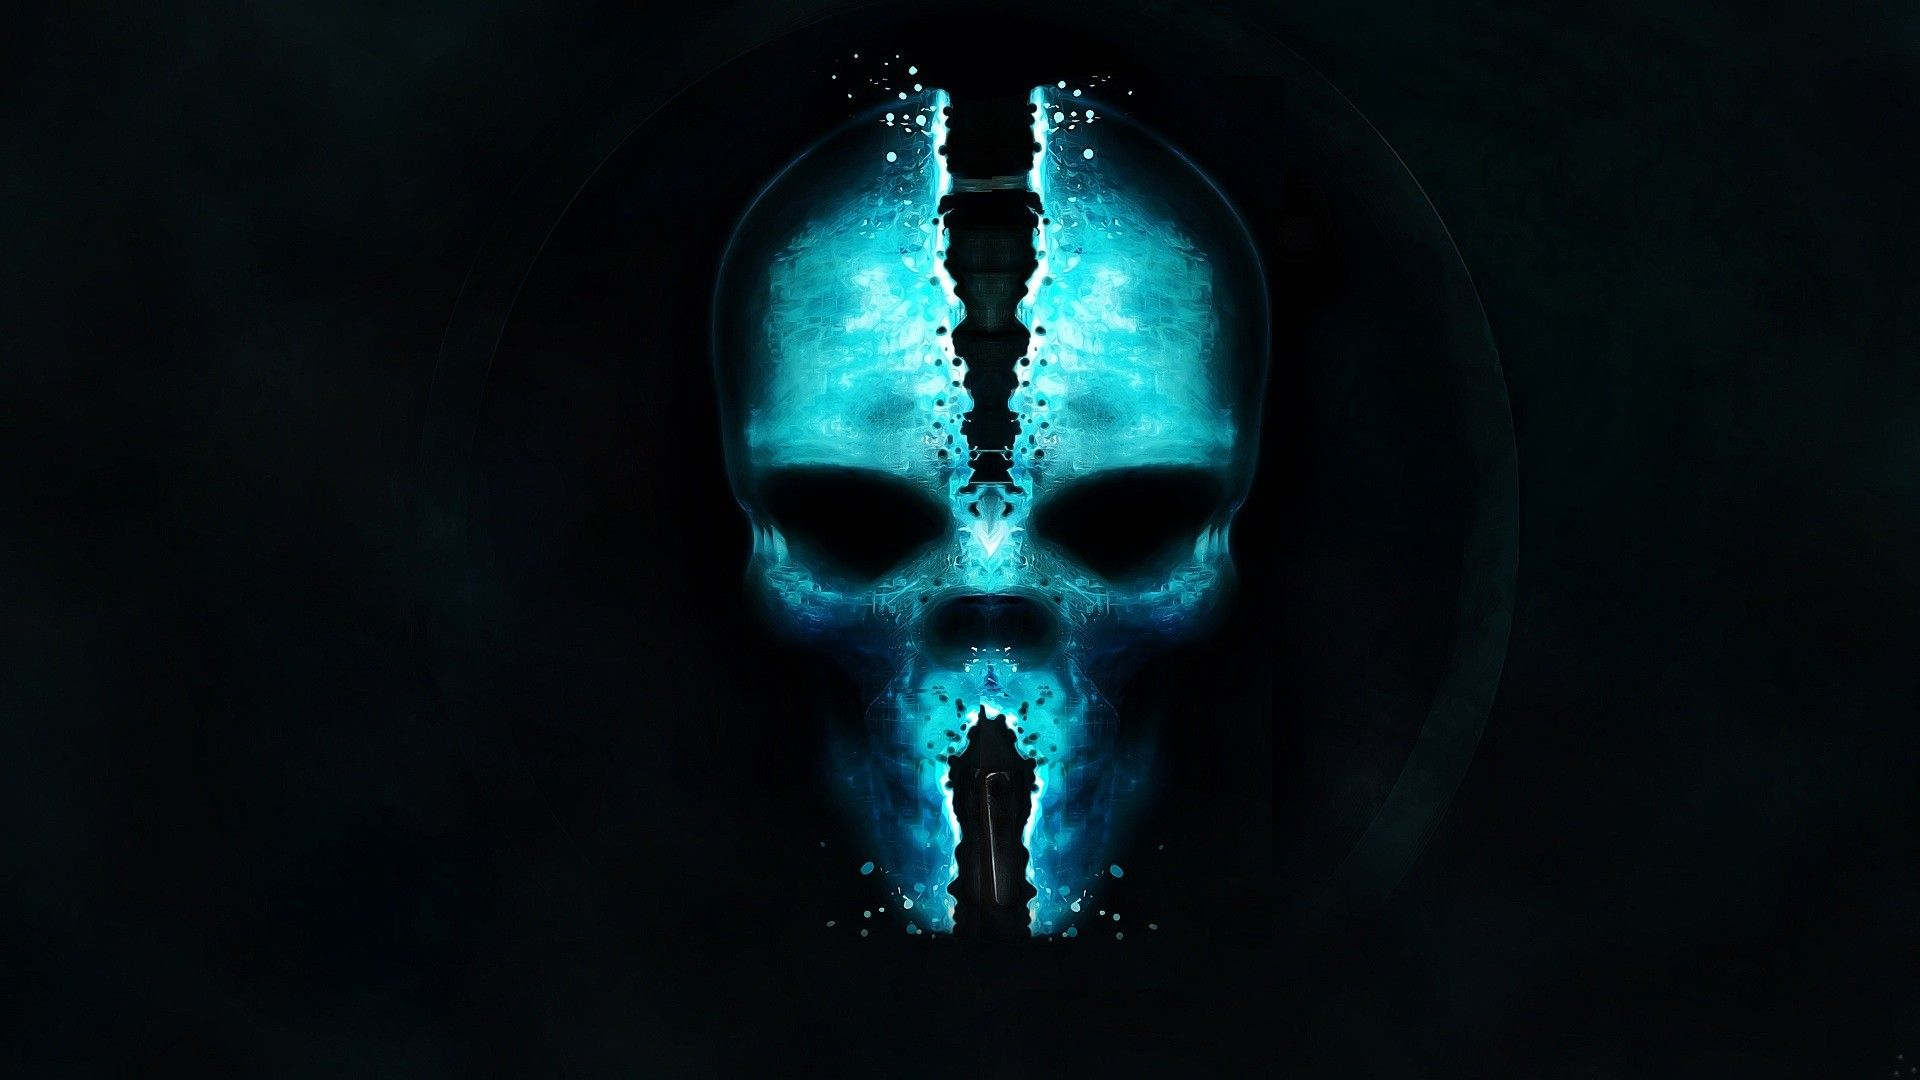 Blue Skull Wallpapers - Wallpaper Cave